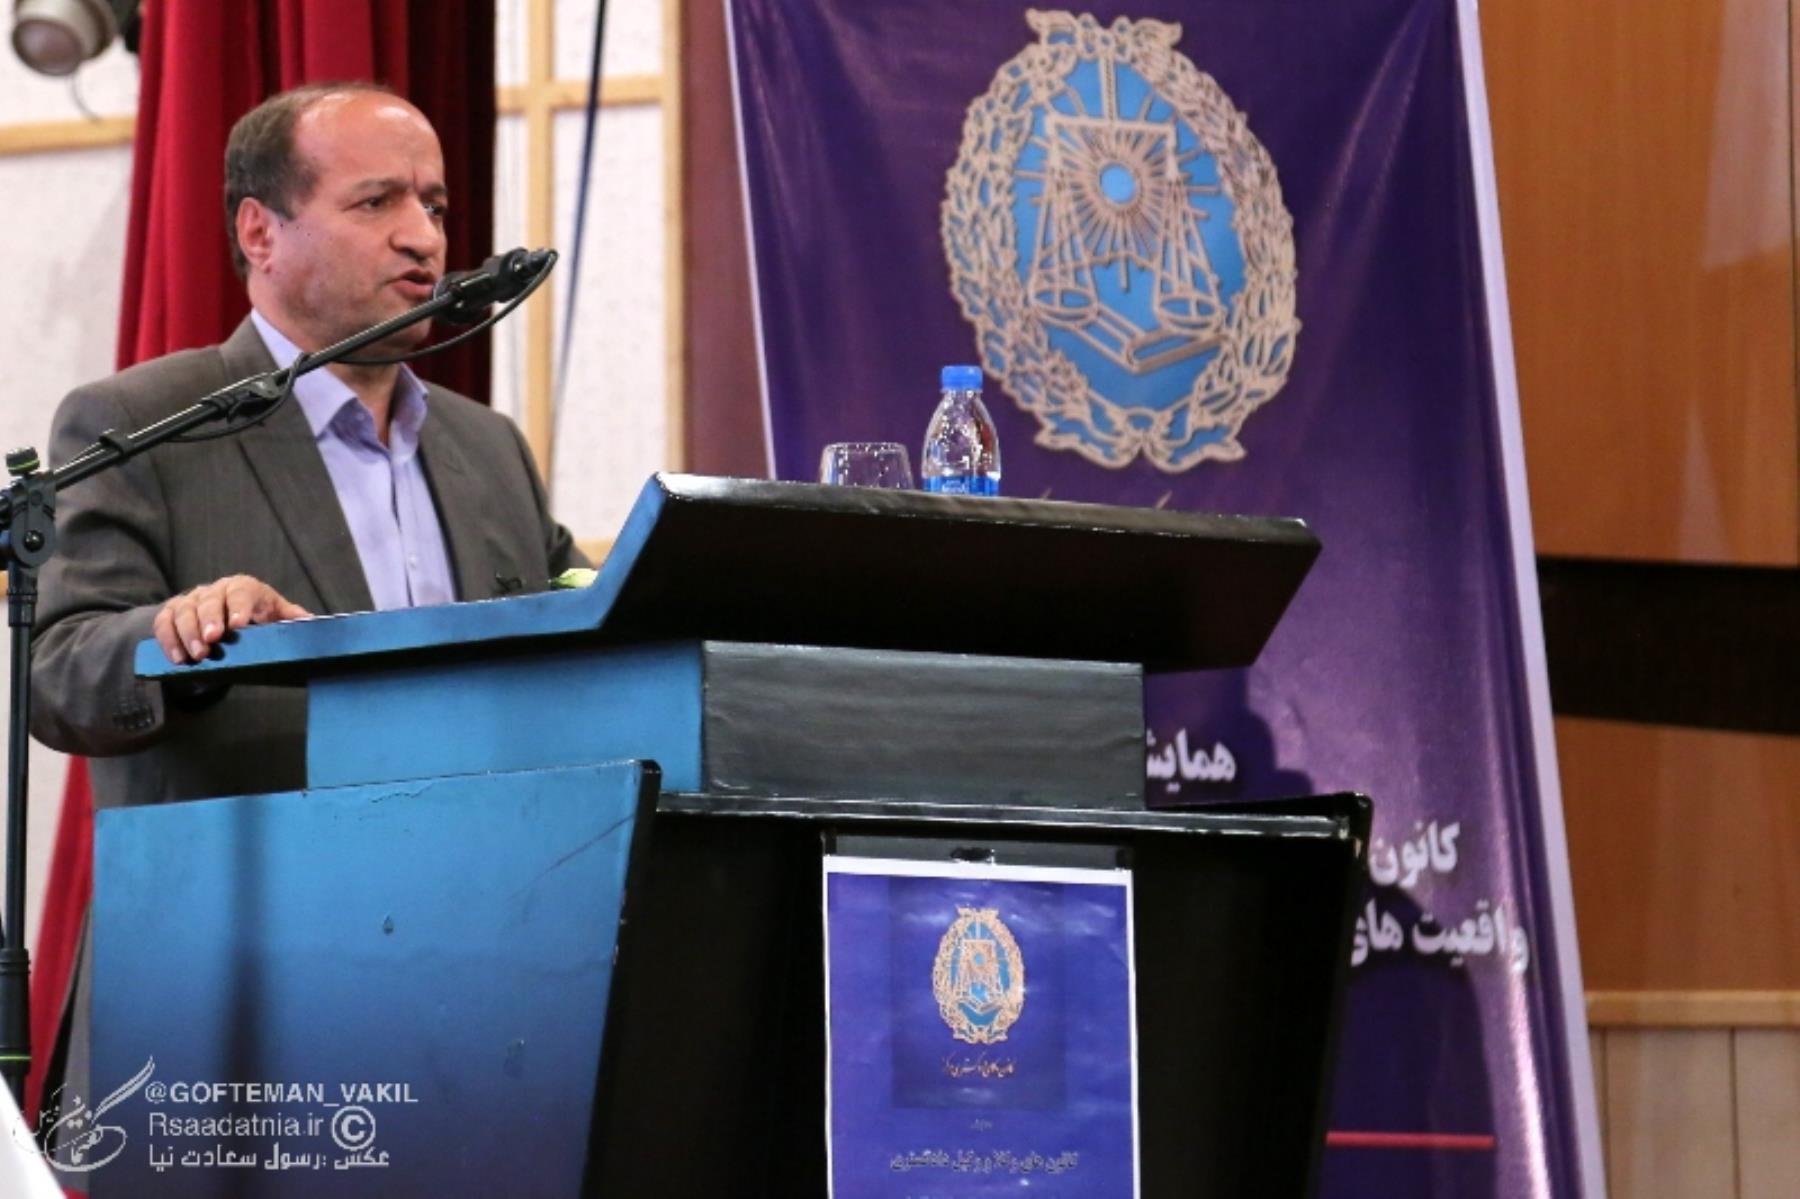 محمد کاظمی  نائب رئیس کمیسیون حقوقی و قضائی مجلس